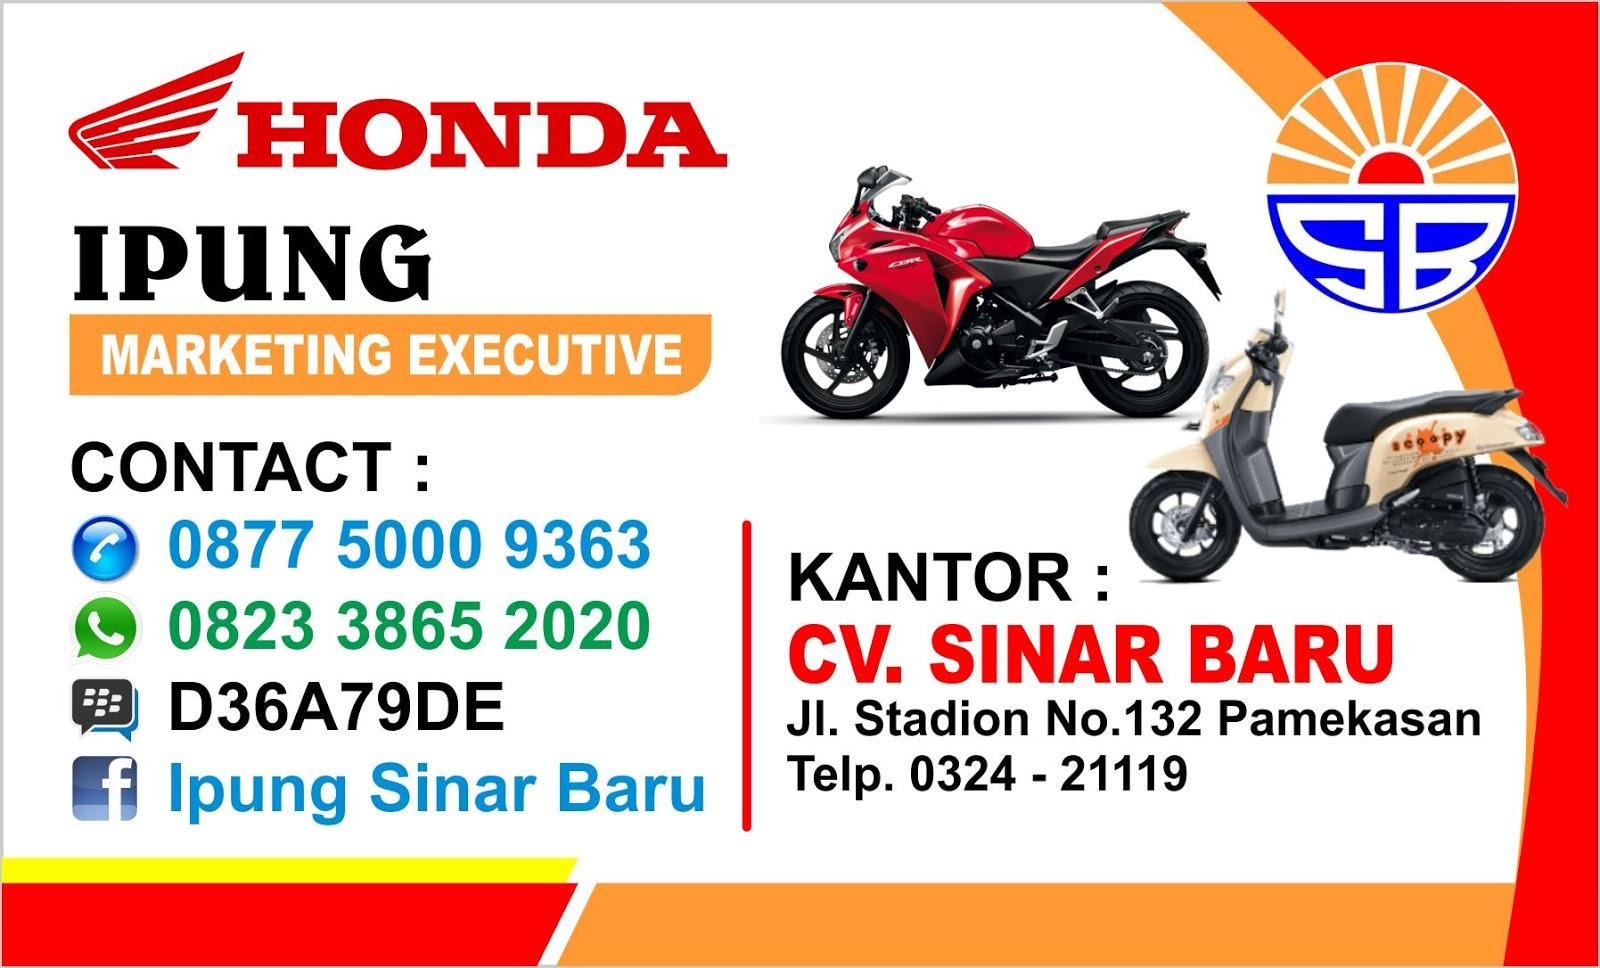 New Beat Esp Cbs Funk Red White List Harga Terkini Dan Terlengkap All Sporty Tecno Blue Tangerang Honda